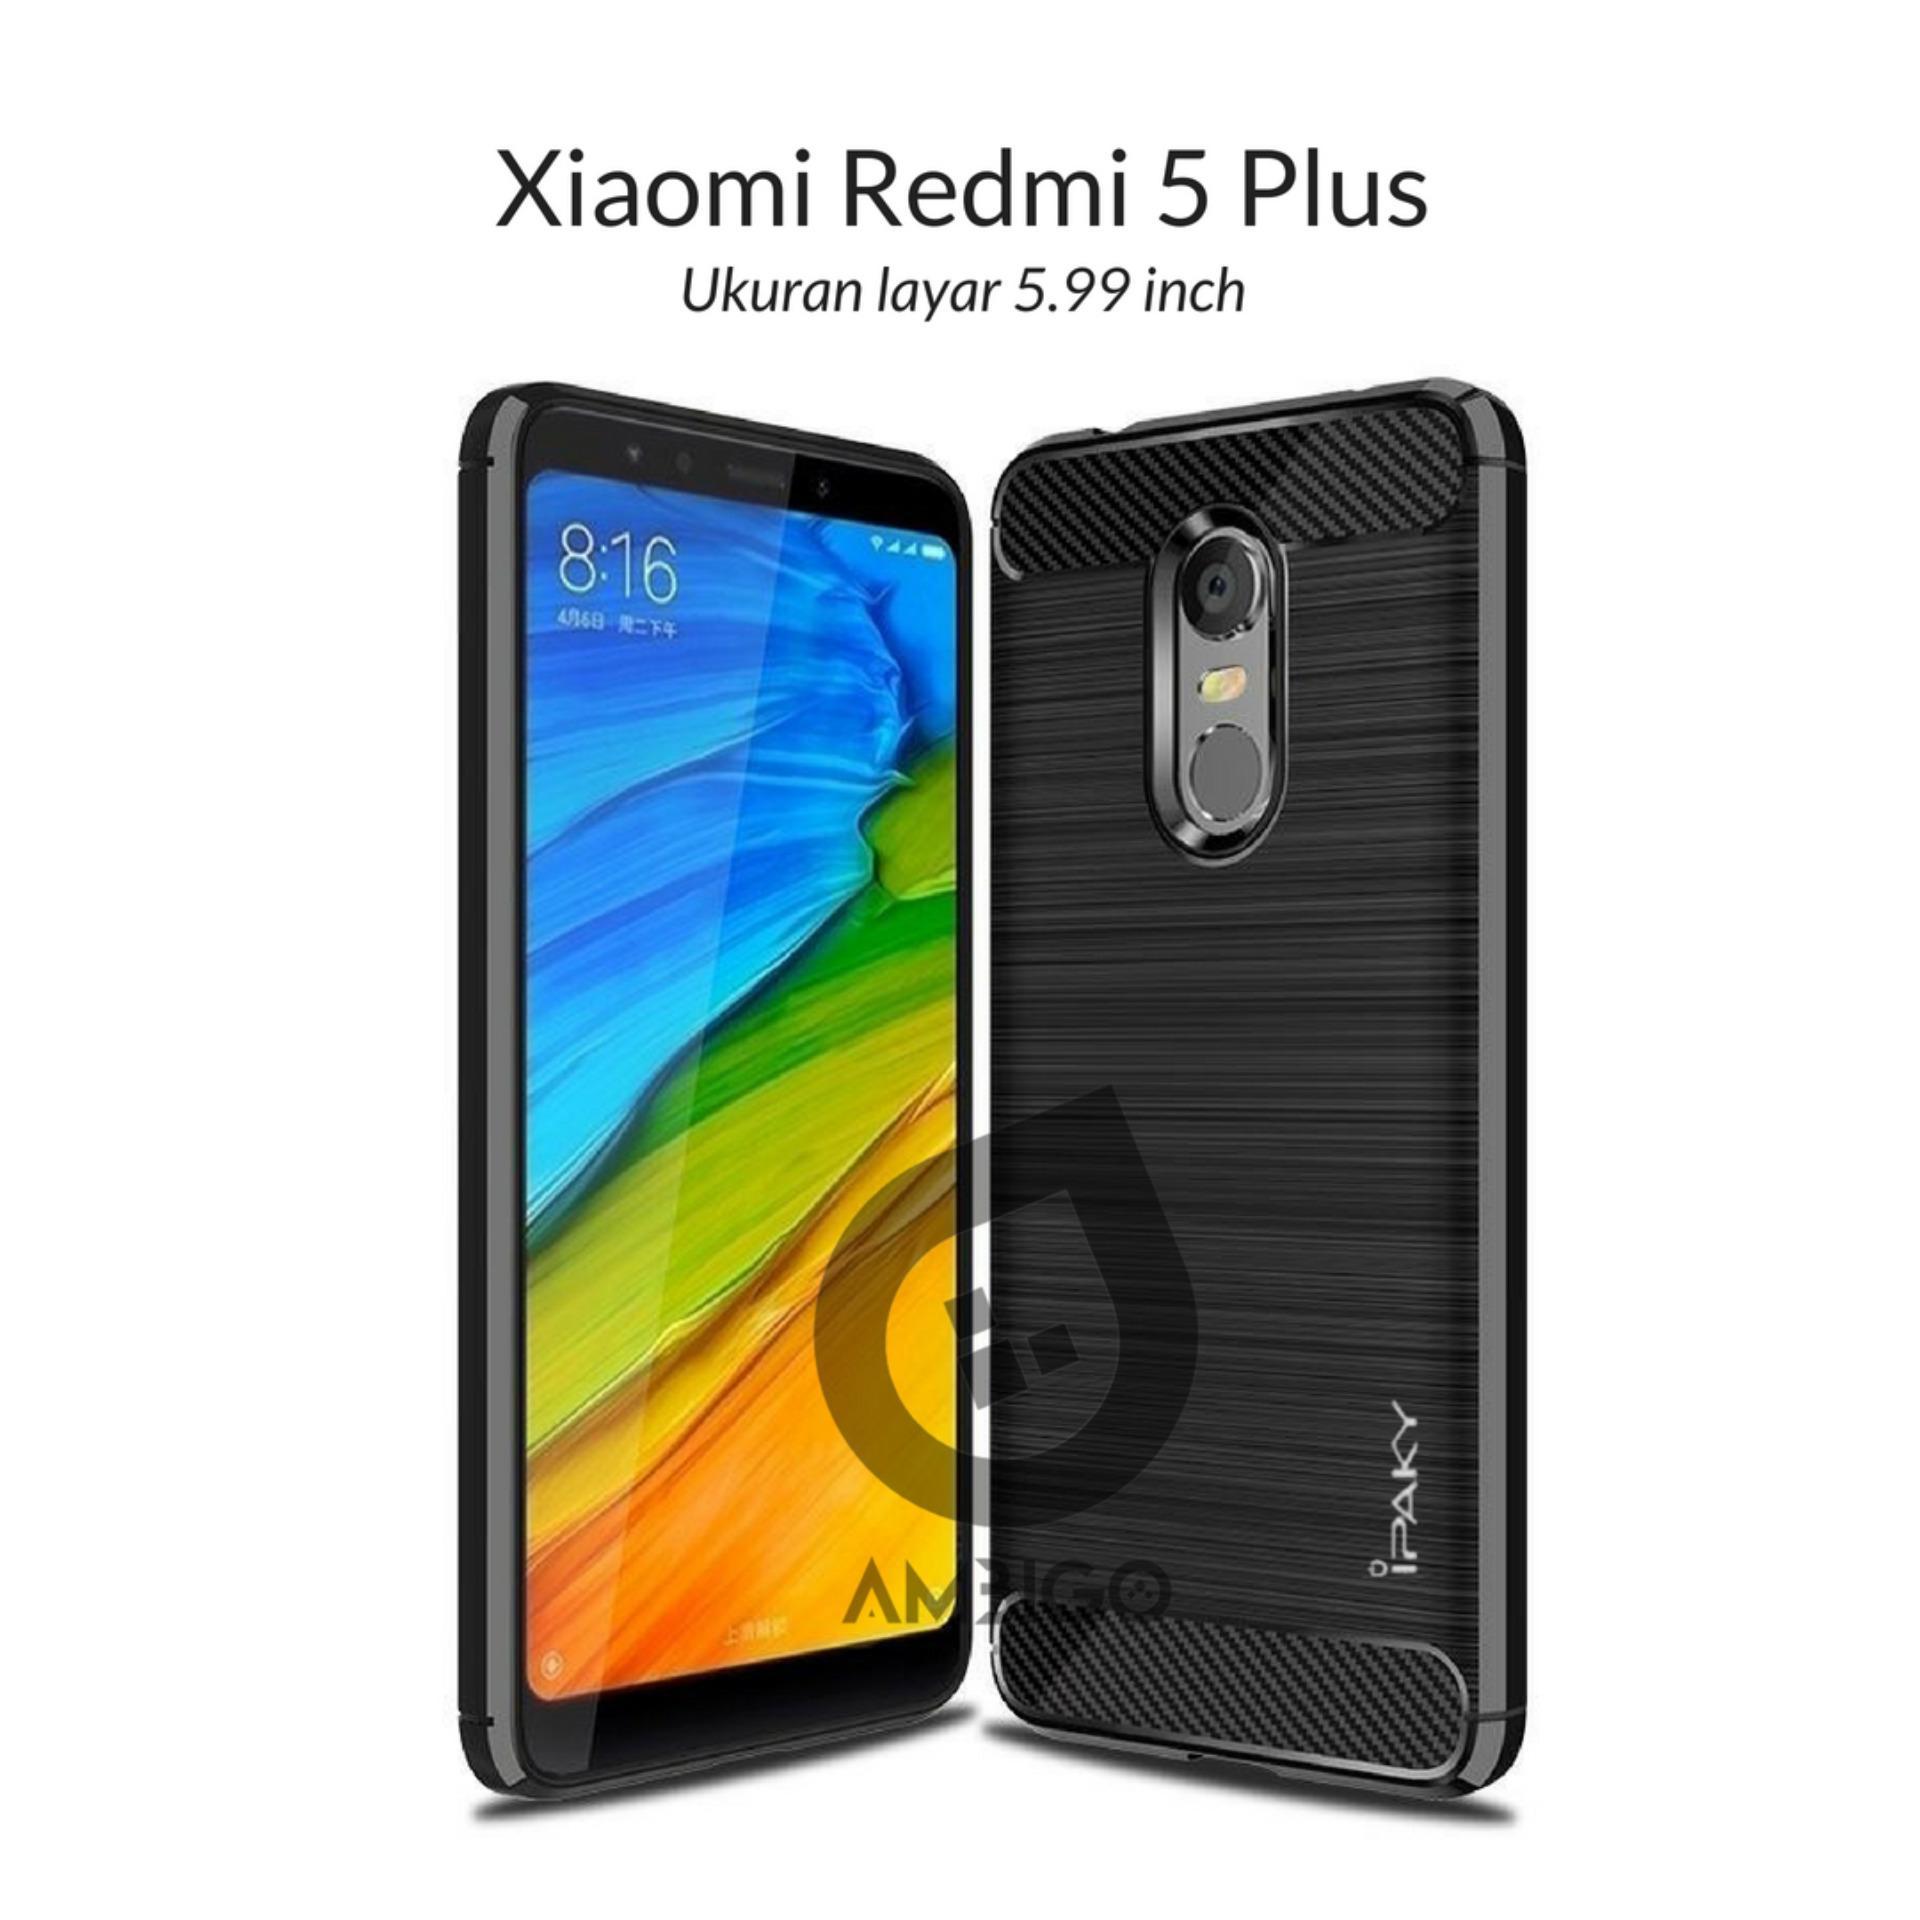 Ambigo Case Xiaomi Redmi 5 Plus ( 5.99 inch ) Premium TPU Quality Carbon Shockproof Hybrid